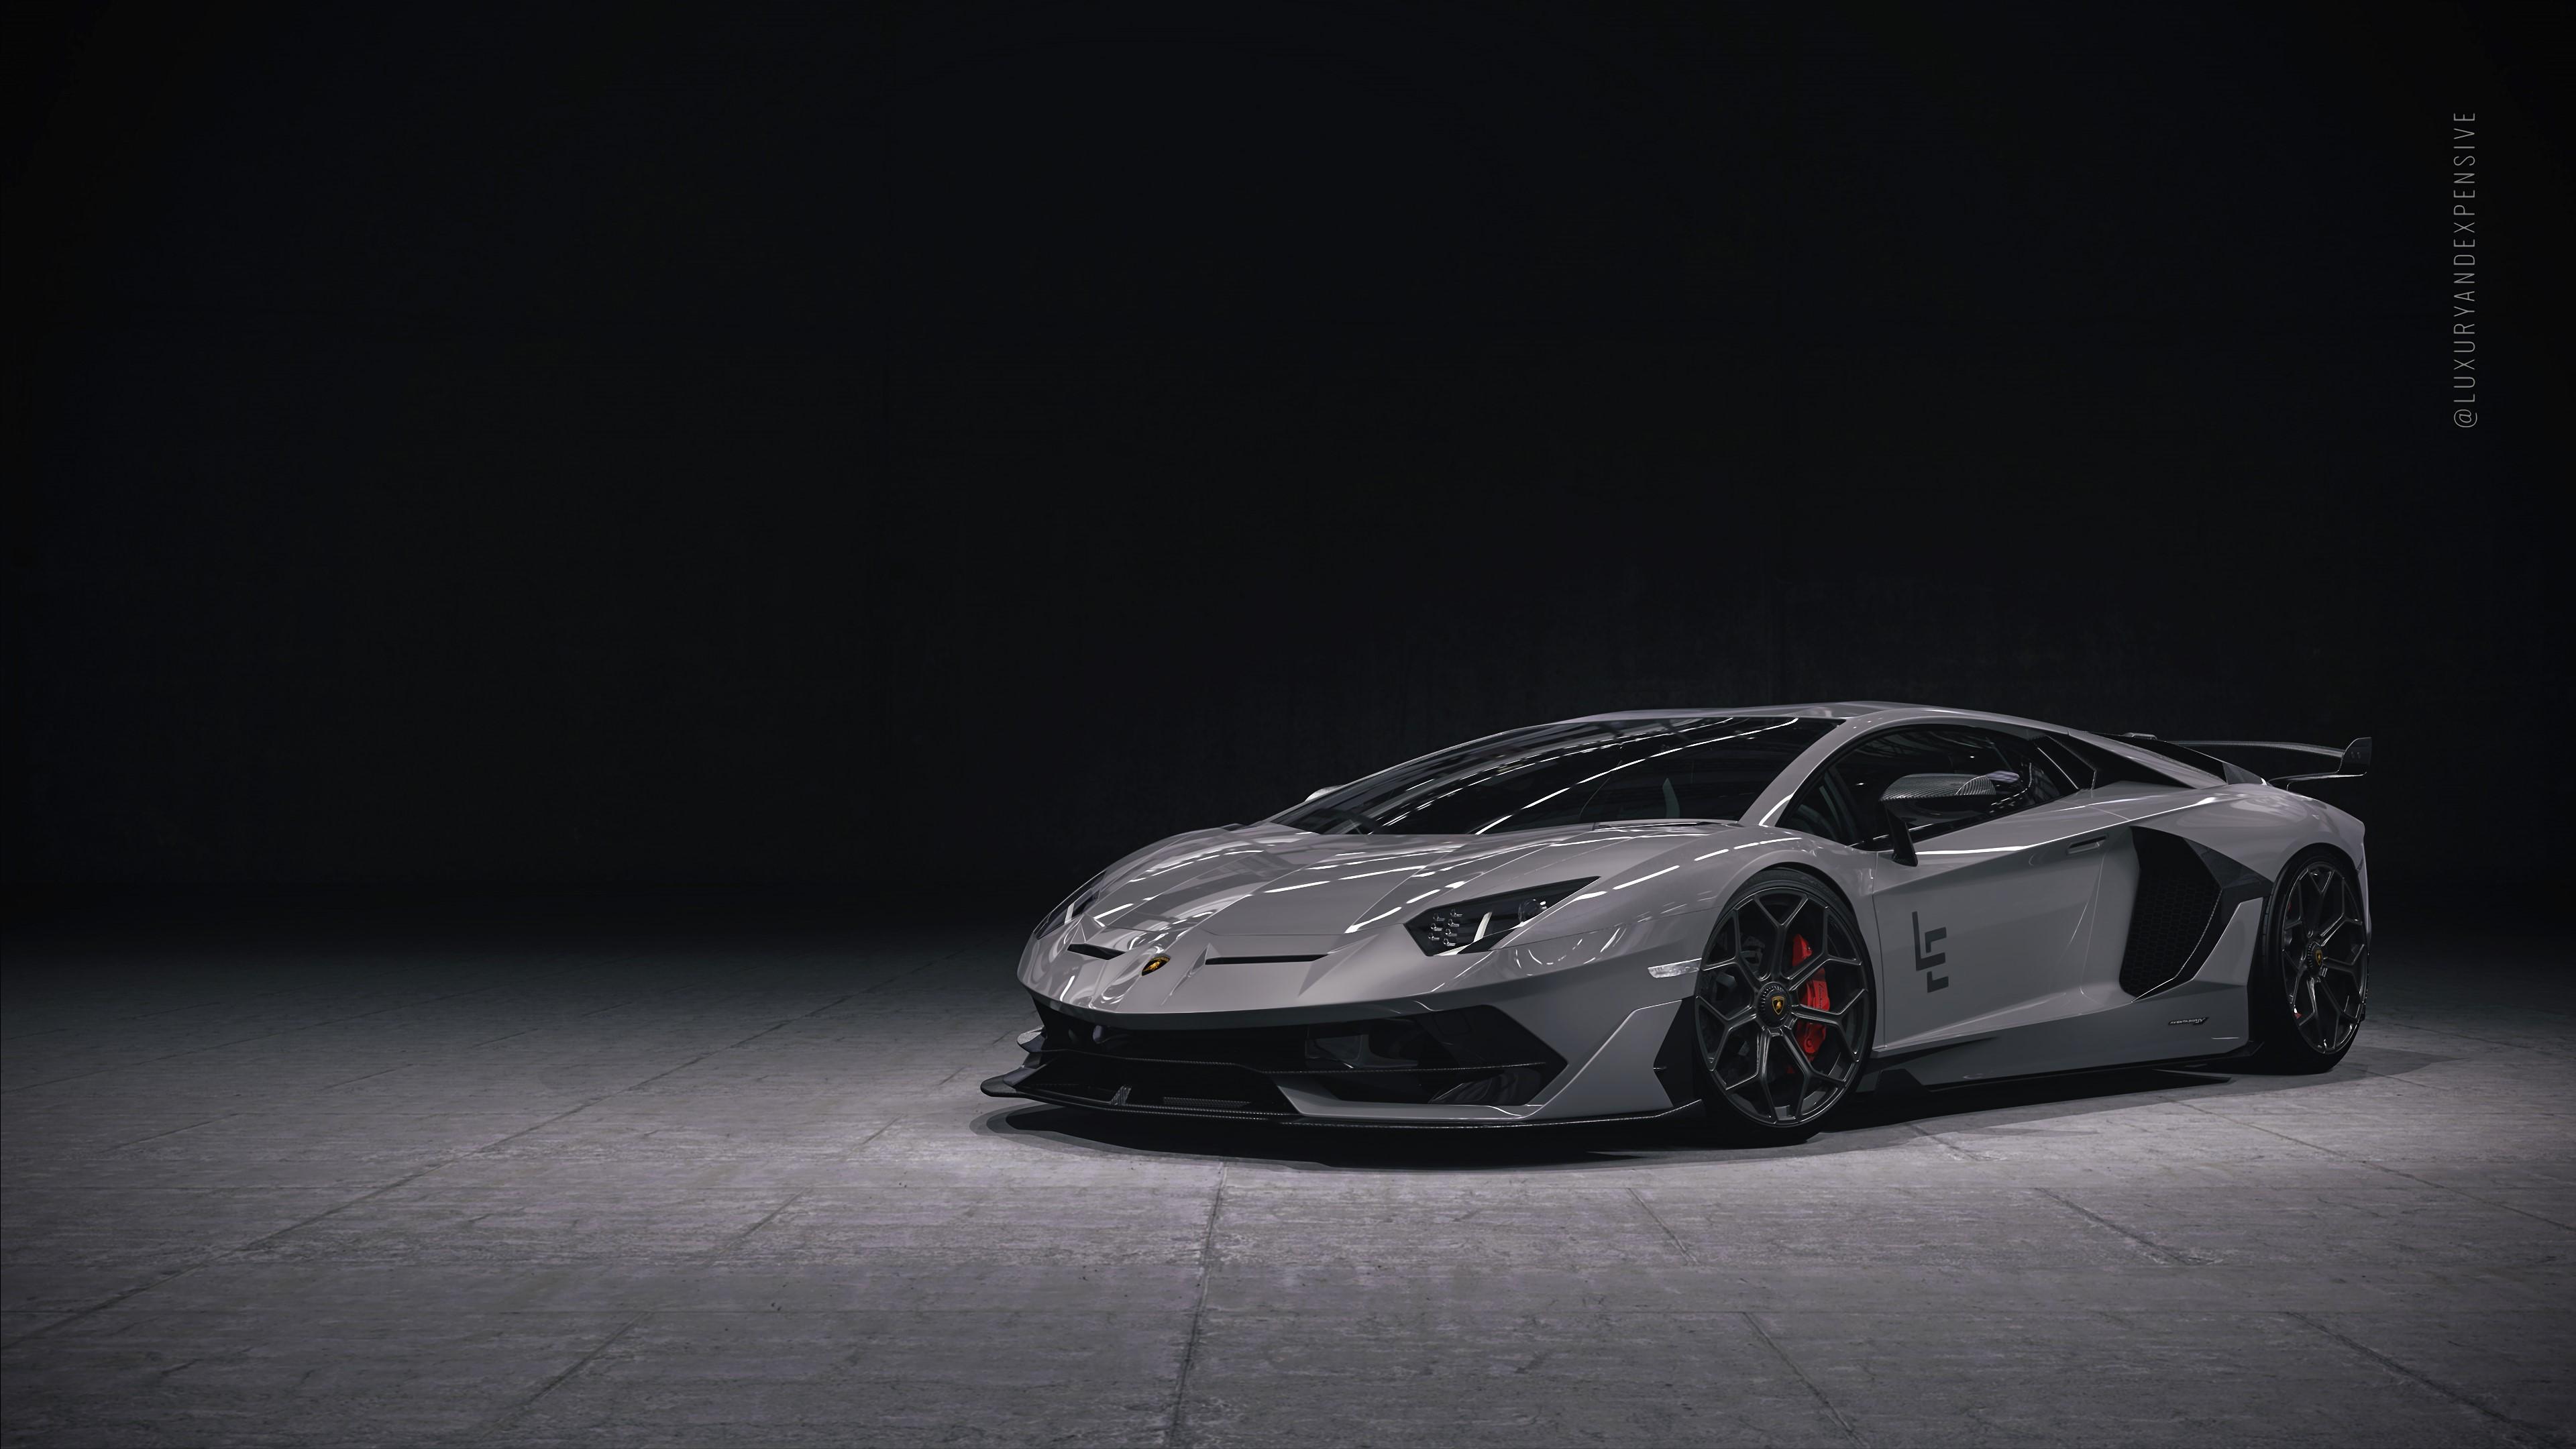 Lamborghini Aventador Svj 4k Ultra Hd Wallpaper Background Image 3840x2160 Id 1041085 Wallpaper Abyss